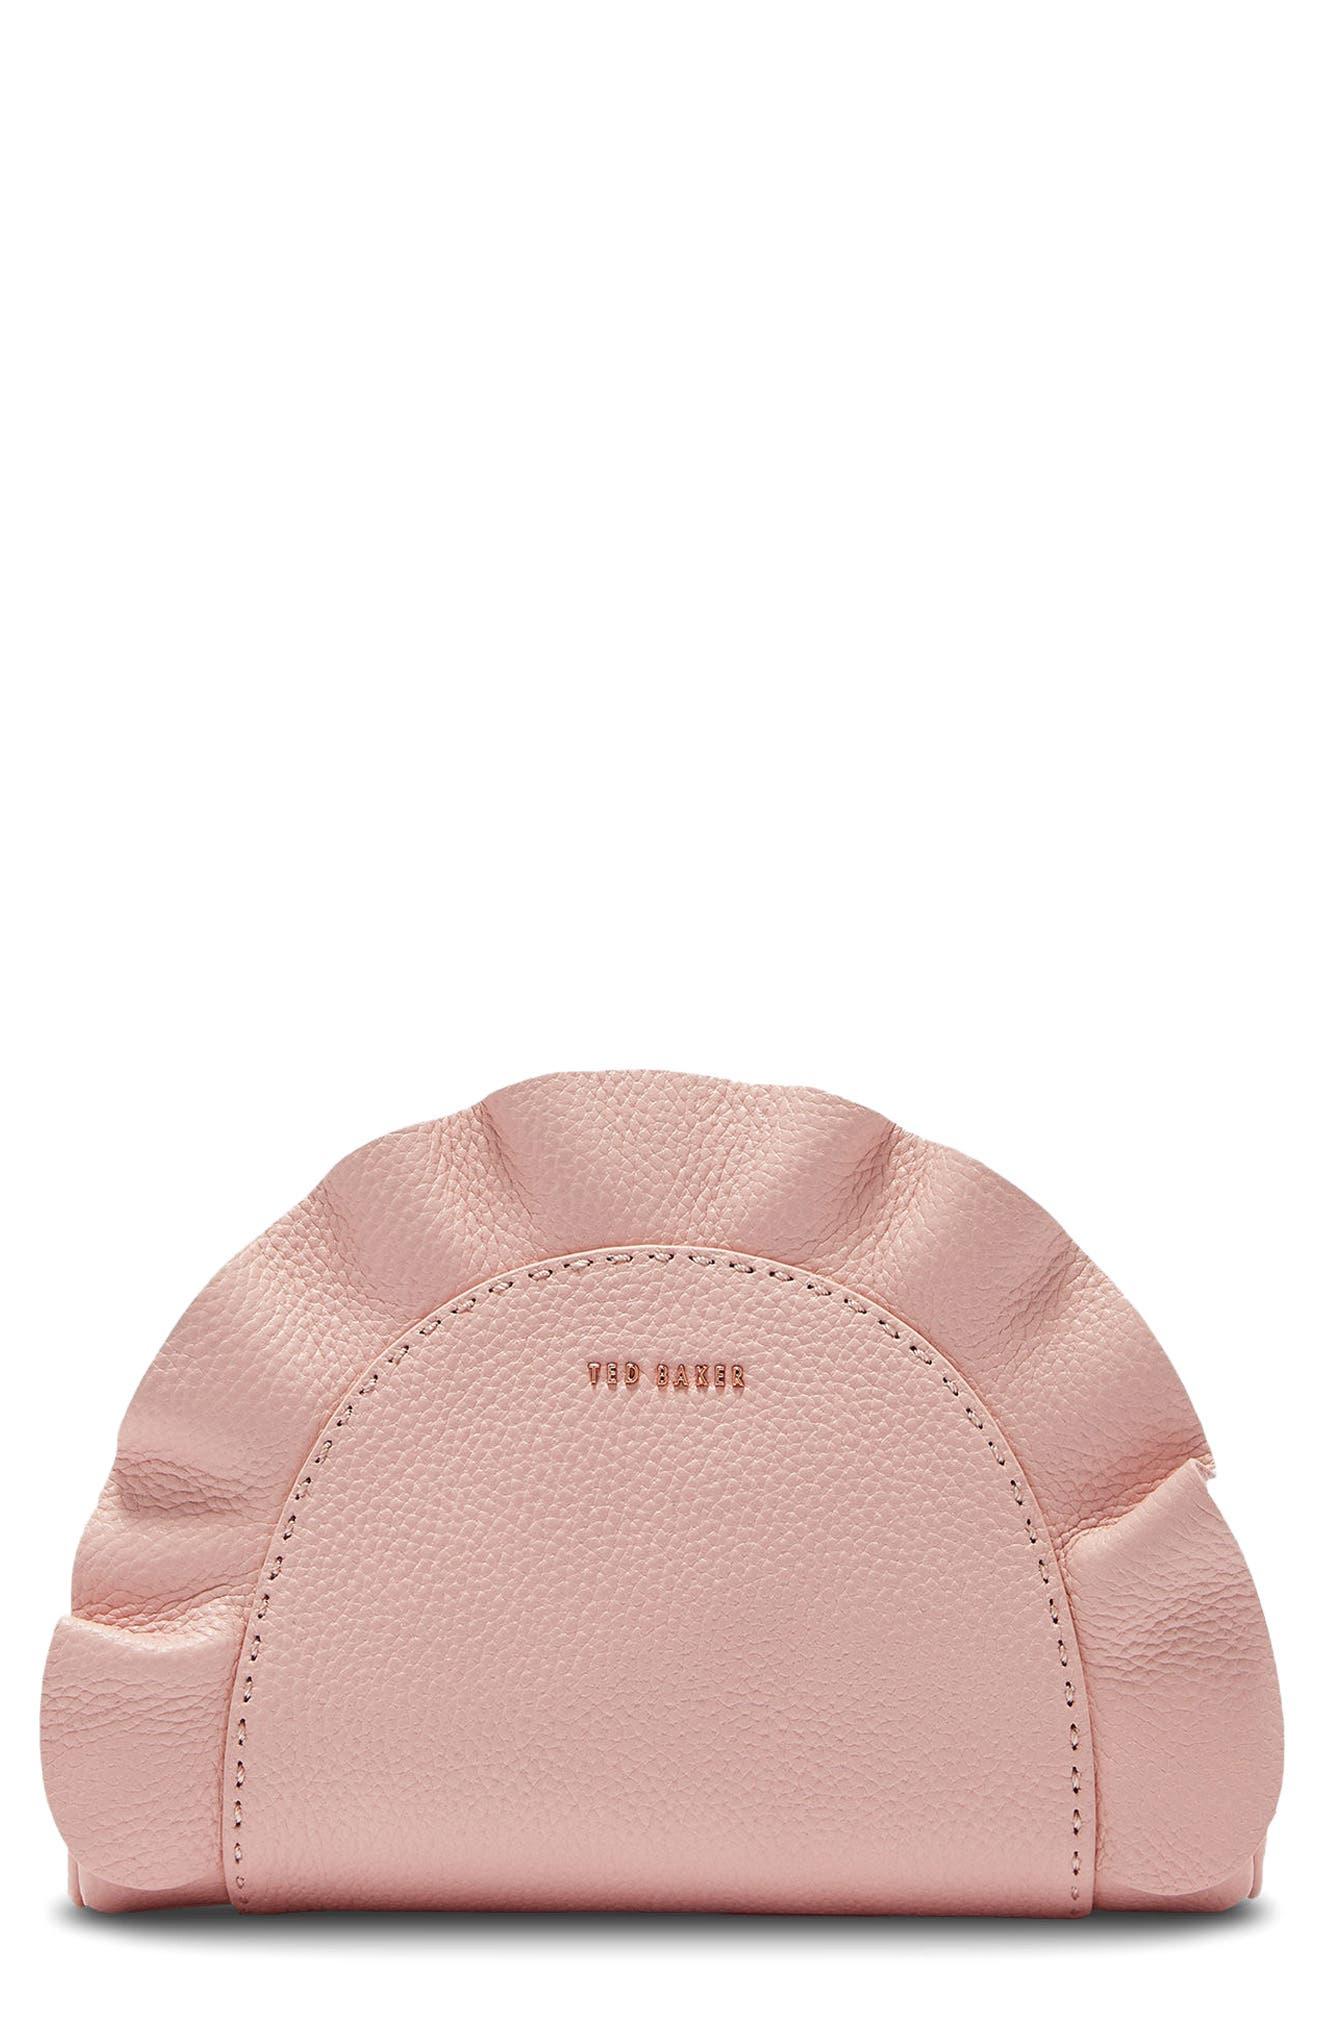 Ruffle Half Moon Leather Crossbody Bag,                             Main thumbnail 1, color,                             Light Pink